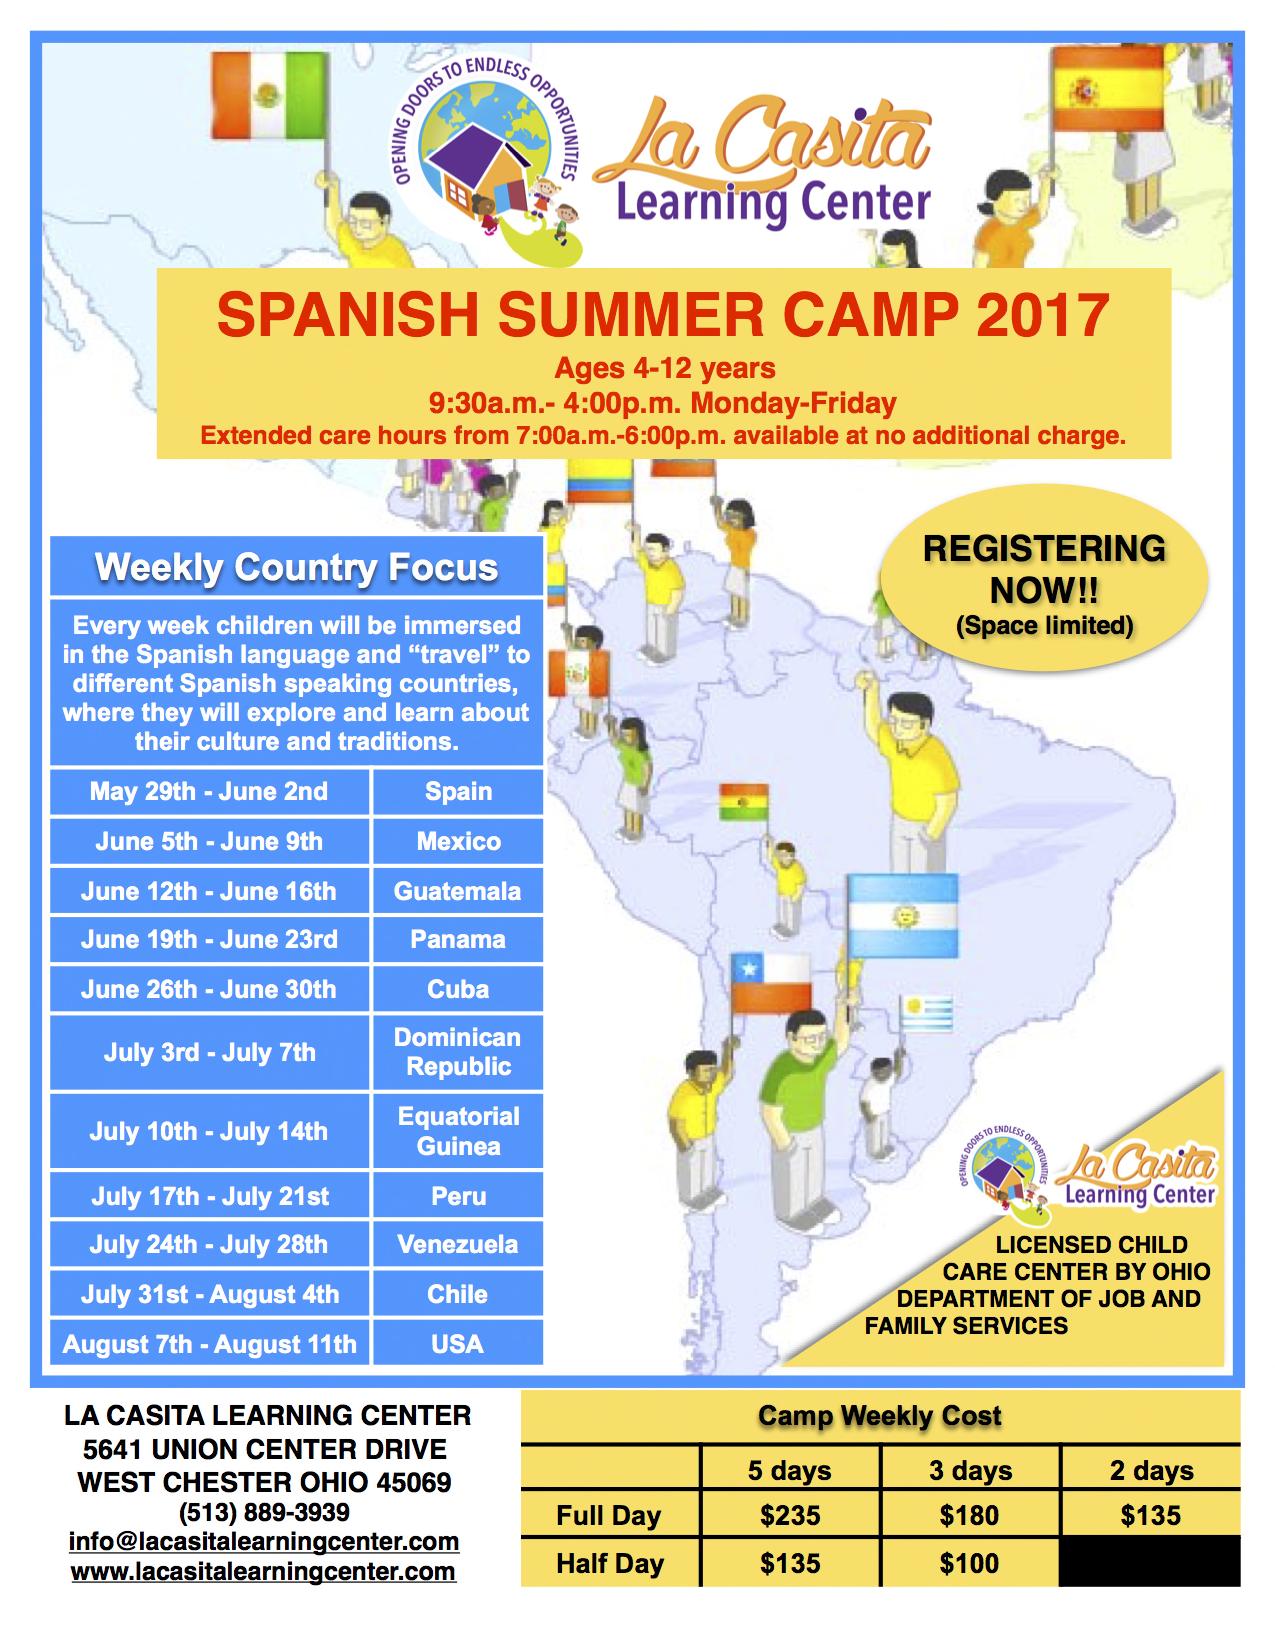 Spanish Summer Camp - La Casita Learning Center